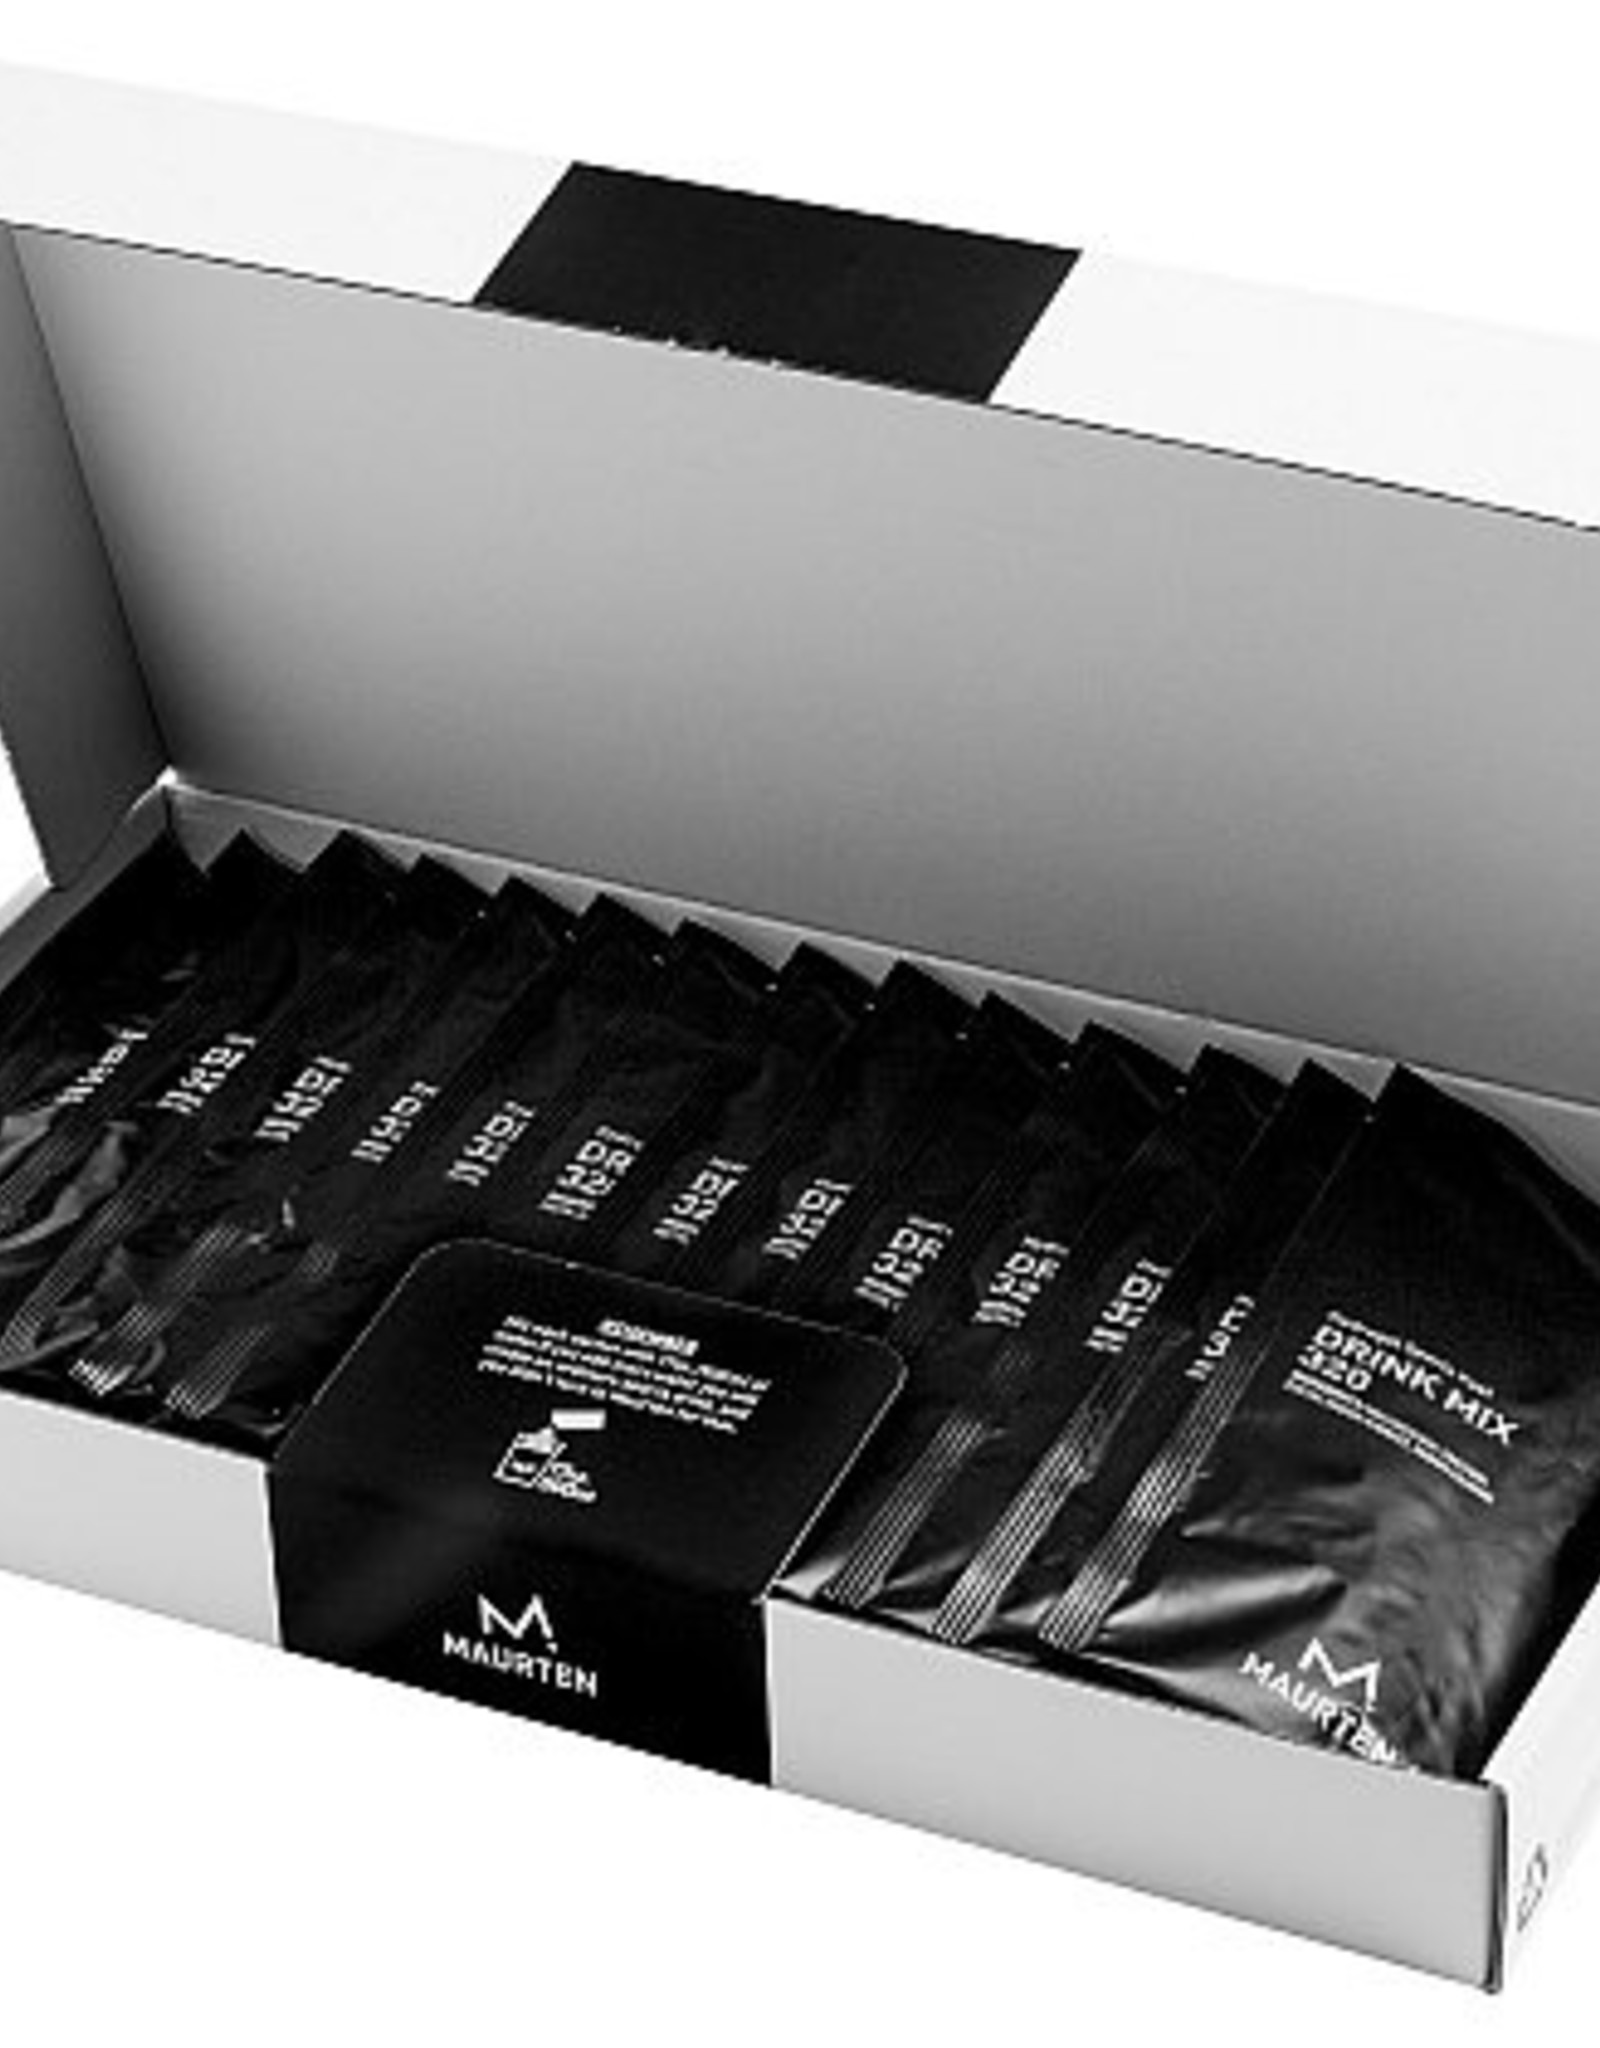 Maurten Maurten Mix 320 box